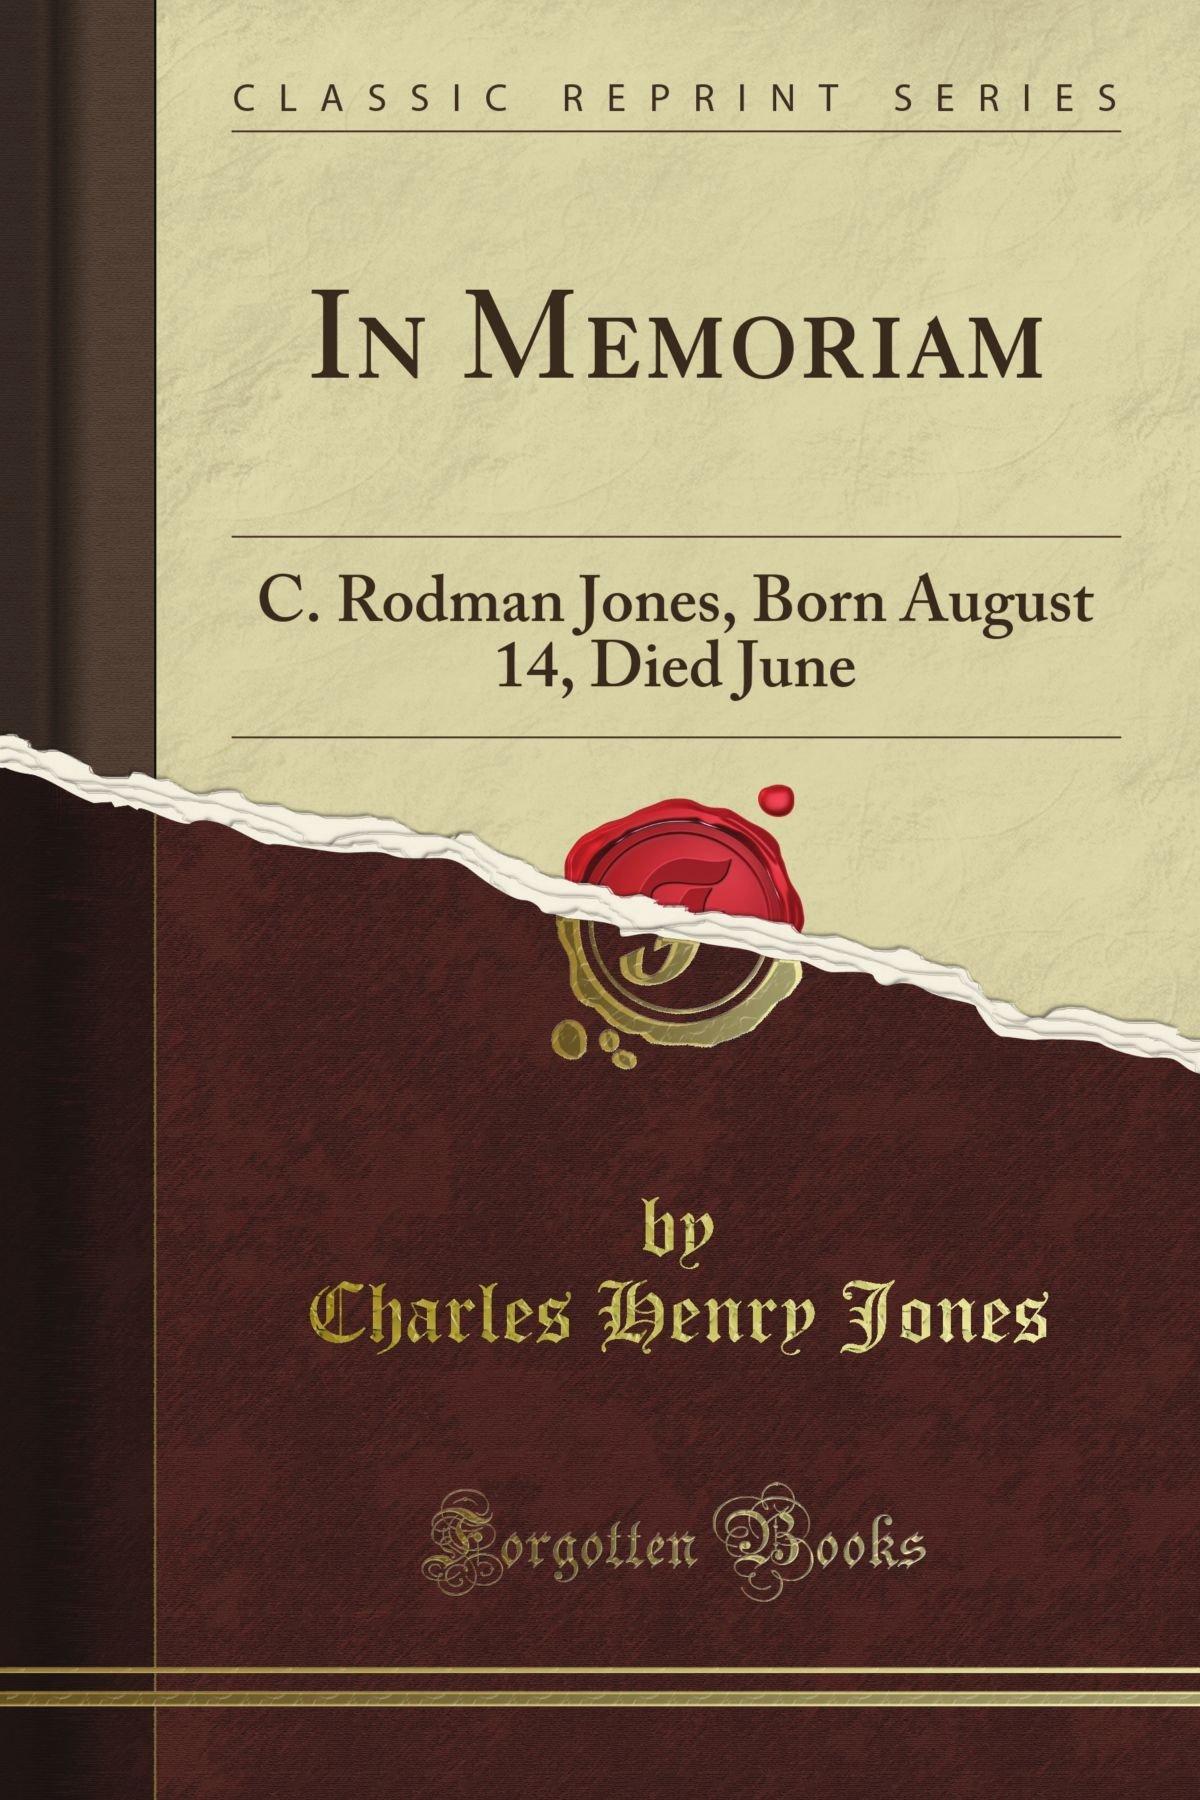 In Memoriam: C. Rodman Jones, Born August 14, Died June (Classic Reprint) ebook